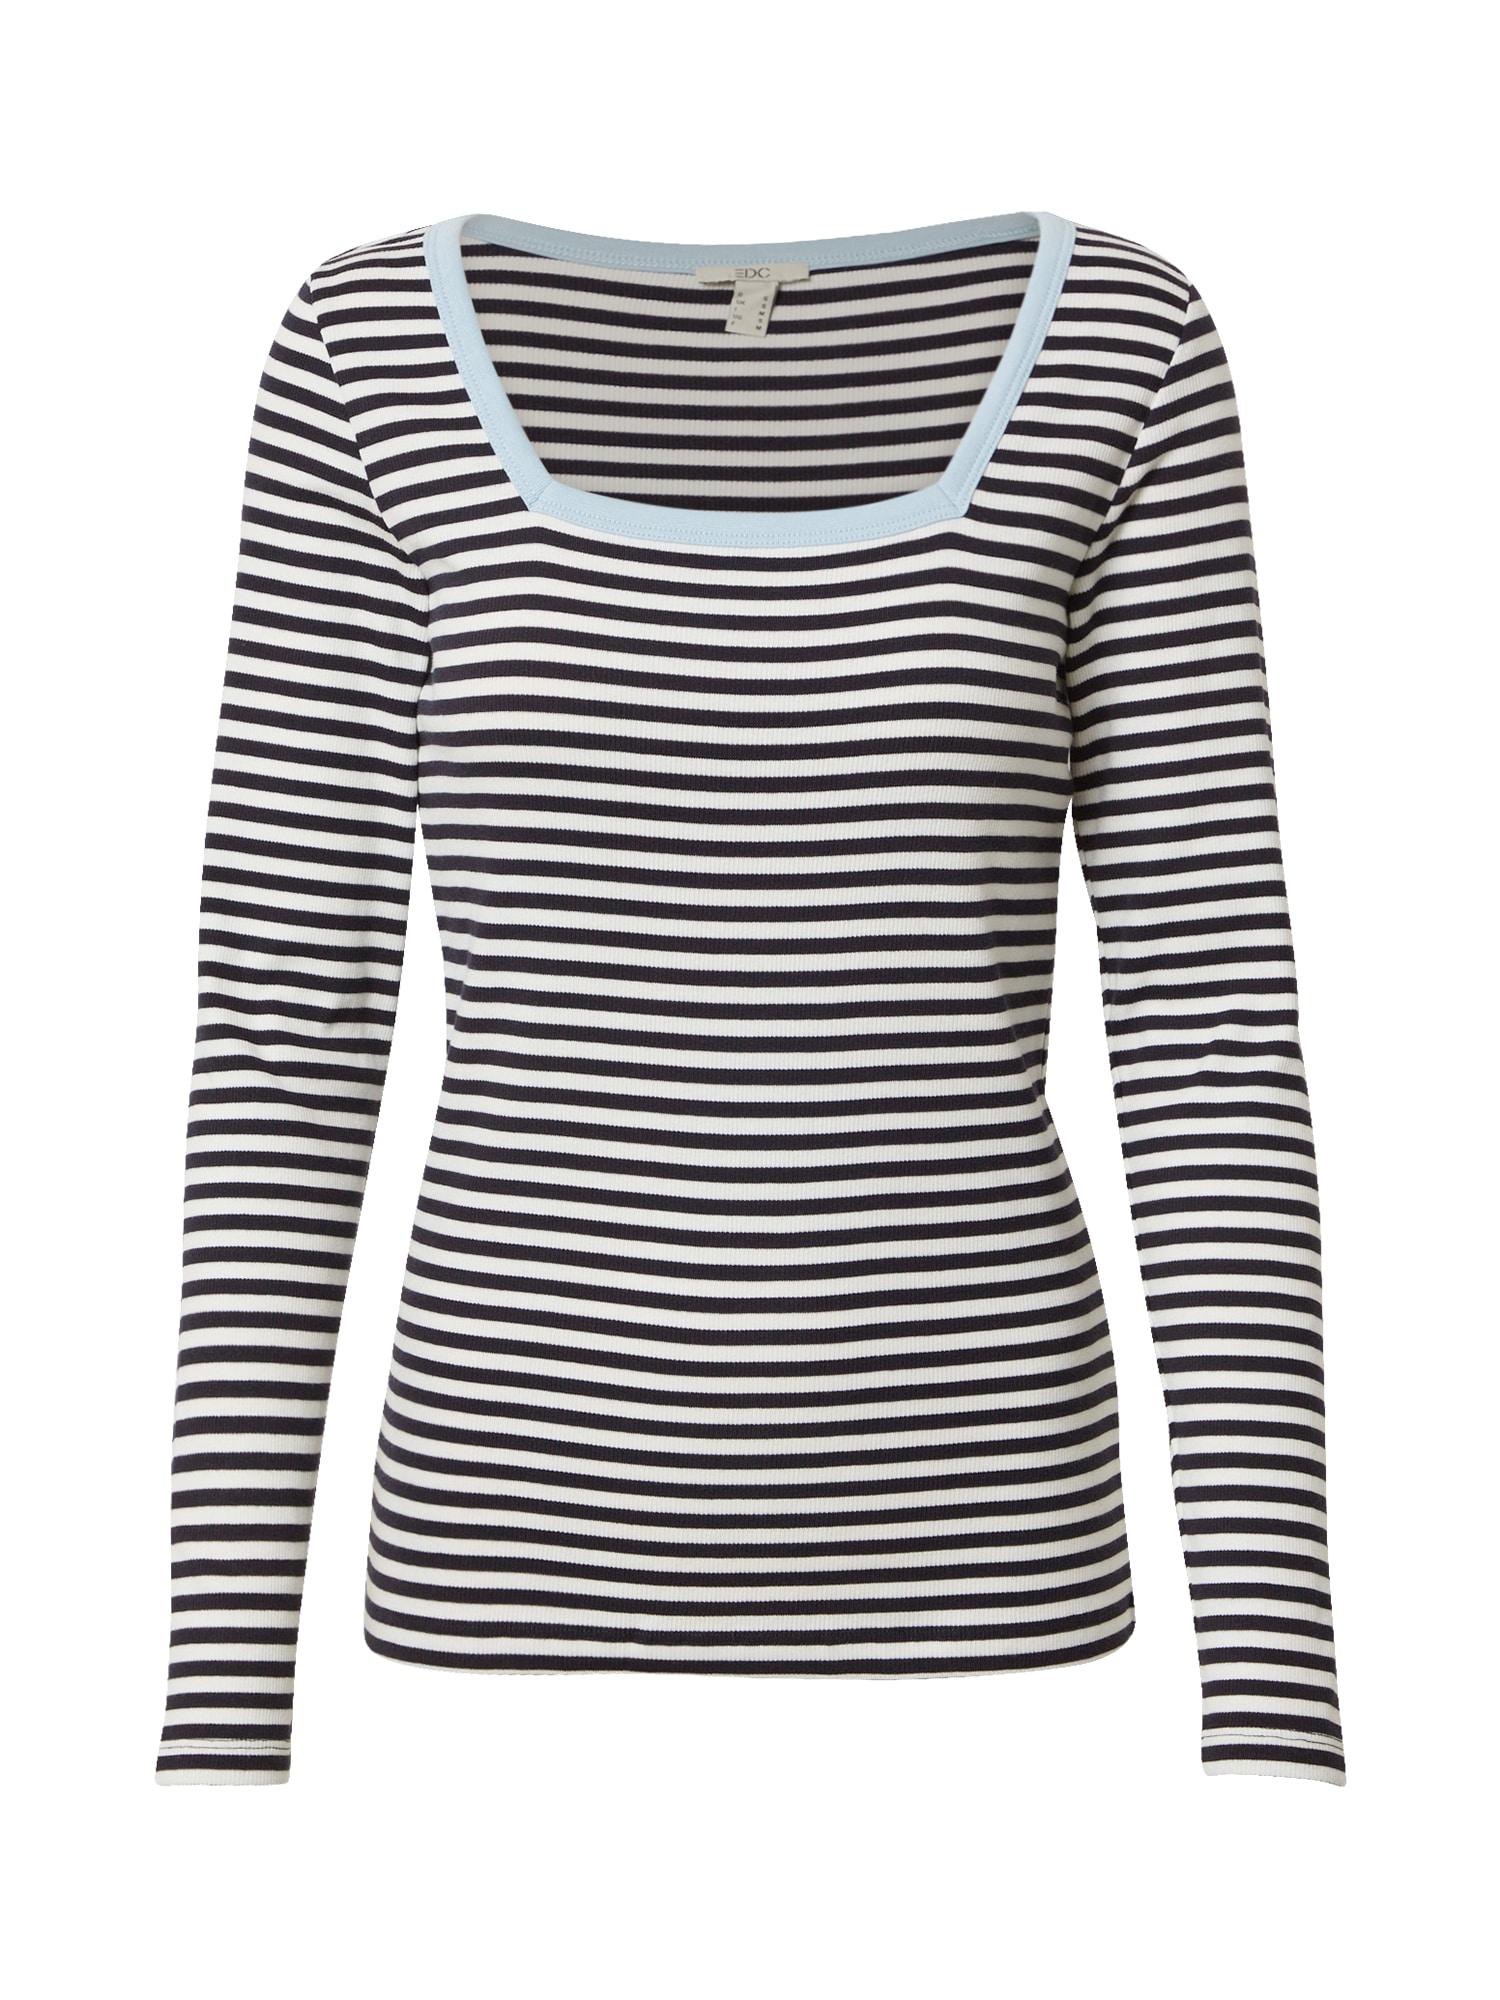 EDC BY ESPRIT Marškinėliai mėlyna / balta / šviesiai mėlyna